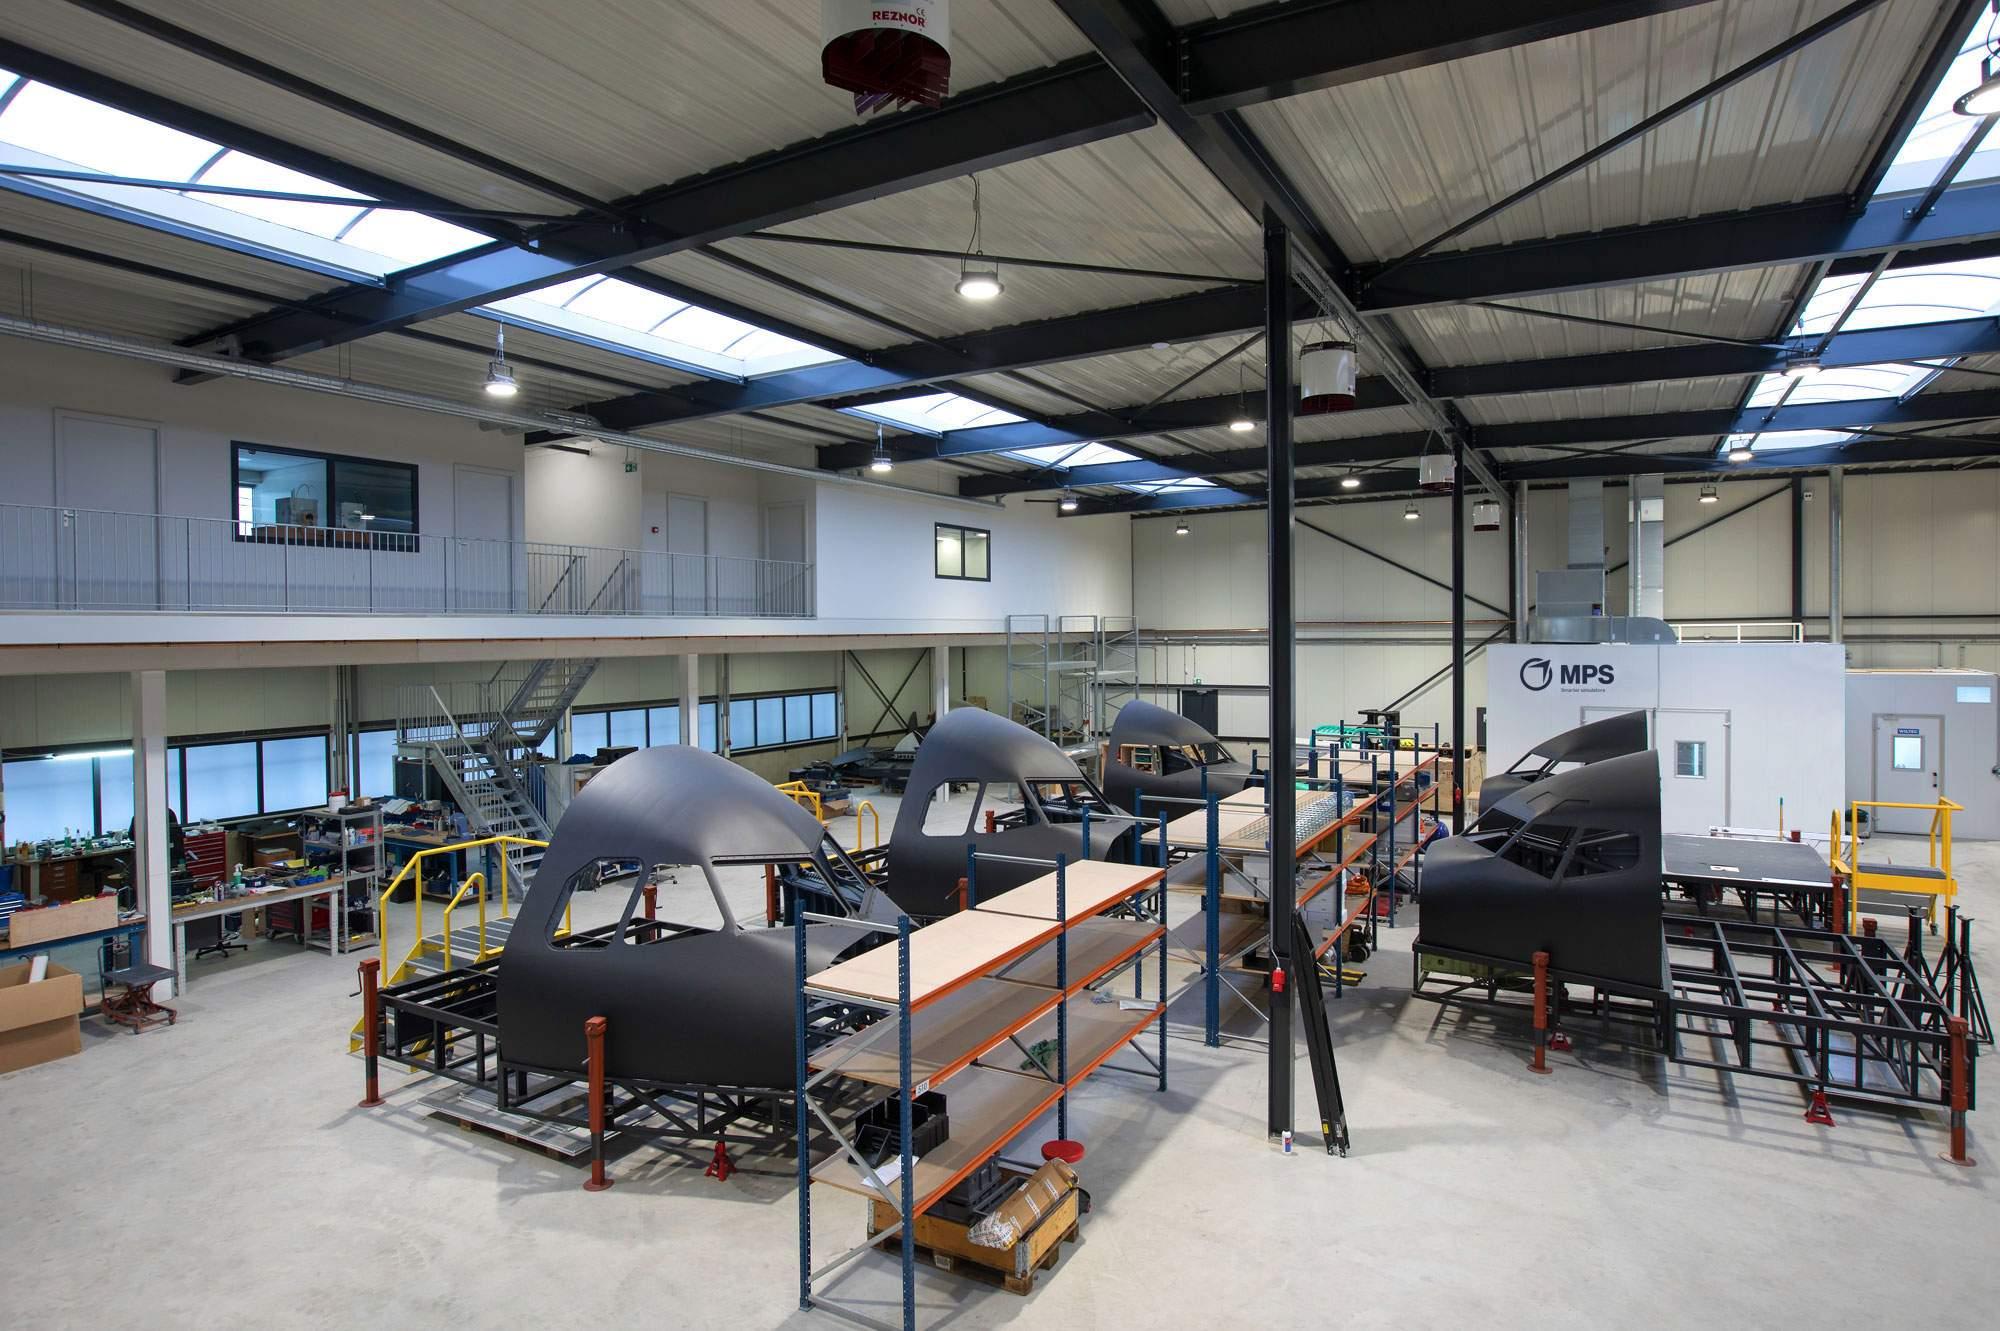 construction facility Multi Pilot Simulations Groenekan Netherlands